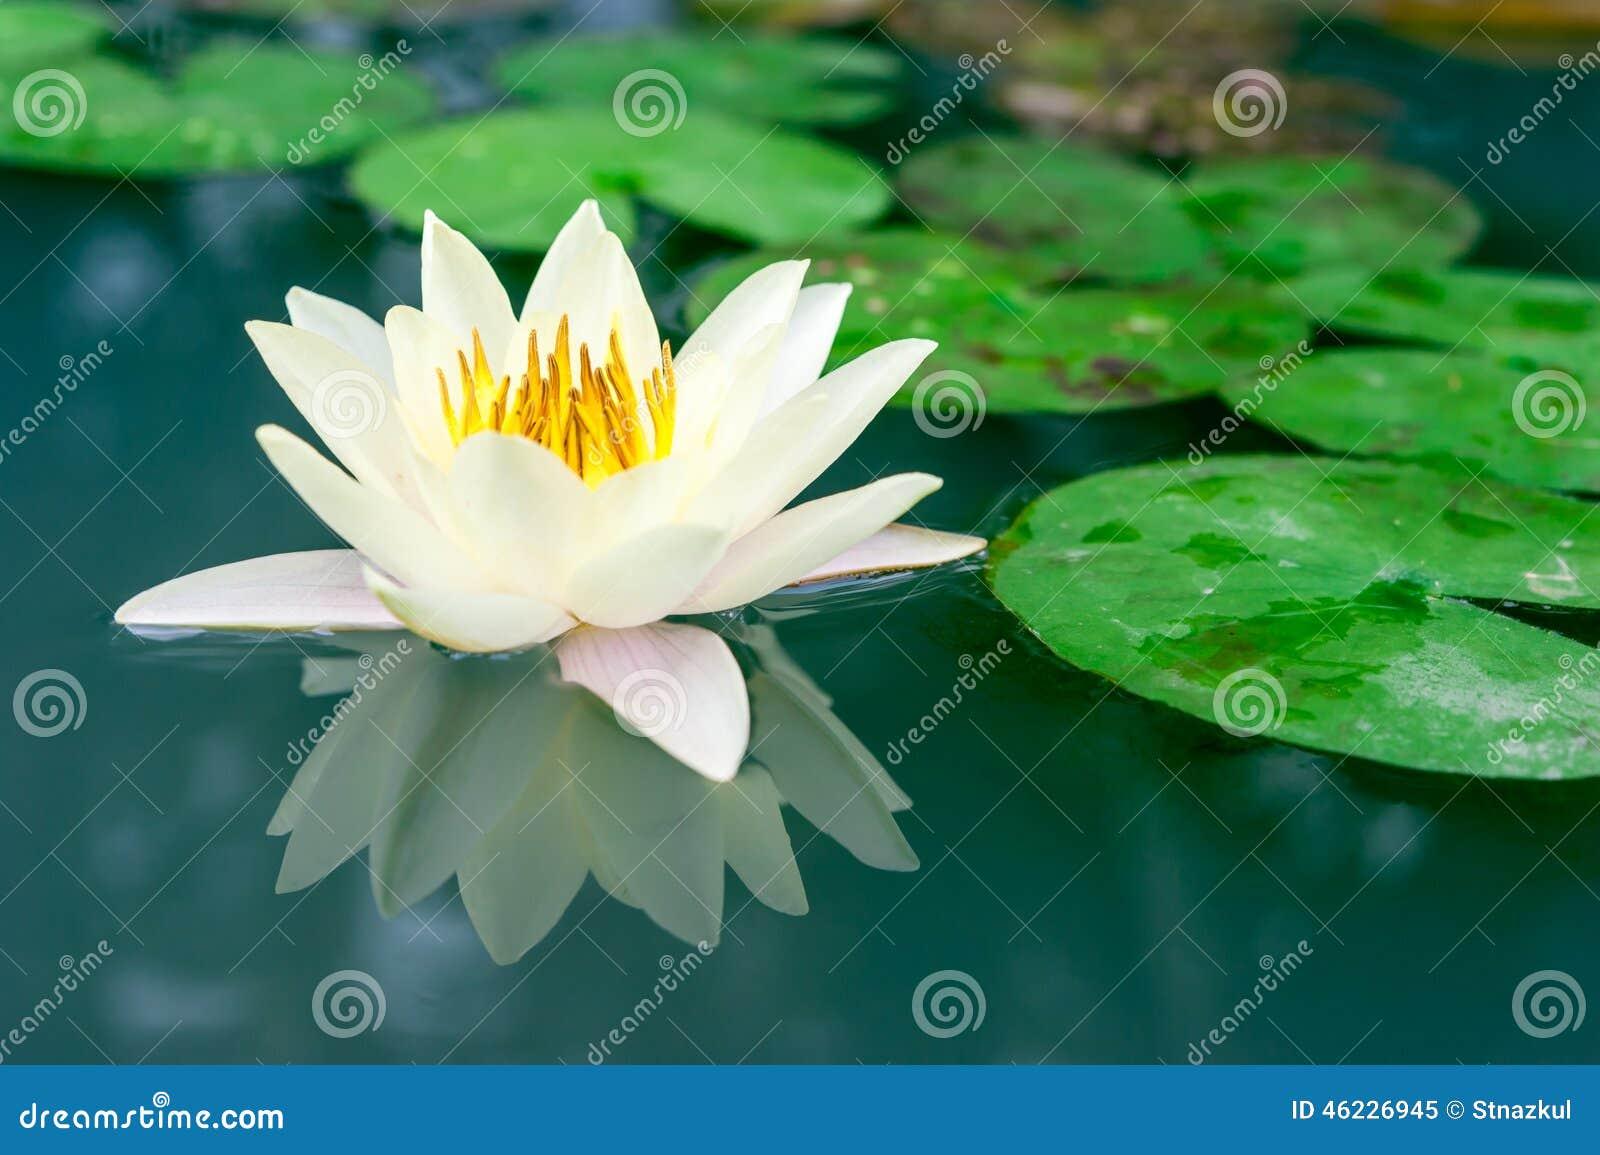 Beautiful yellow lotus flower in pond stock image image of beautiful yellow lotus flower in pond elegance floral izmirmasajfo Gallery